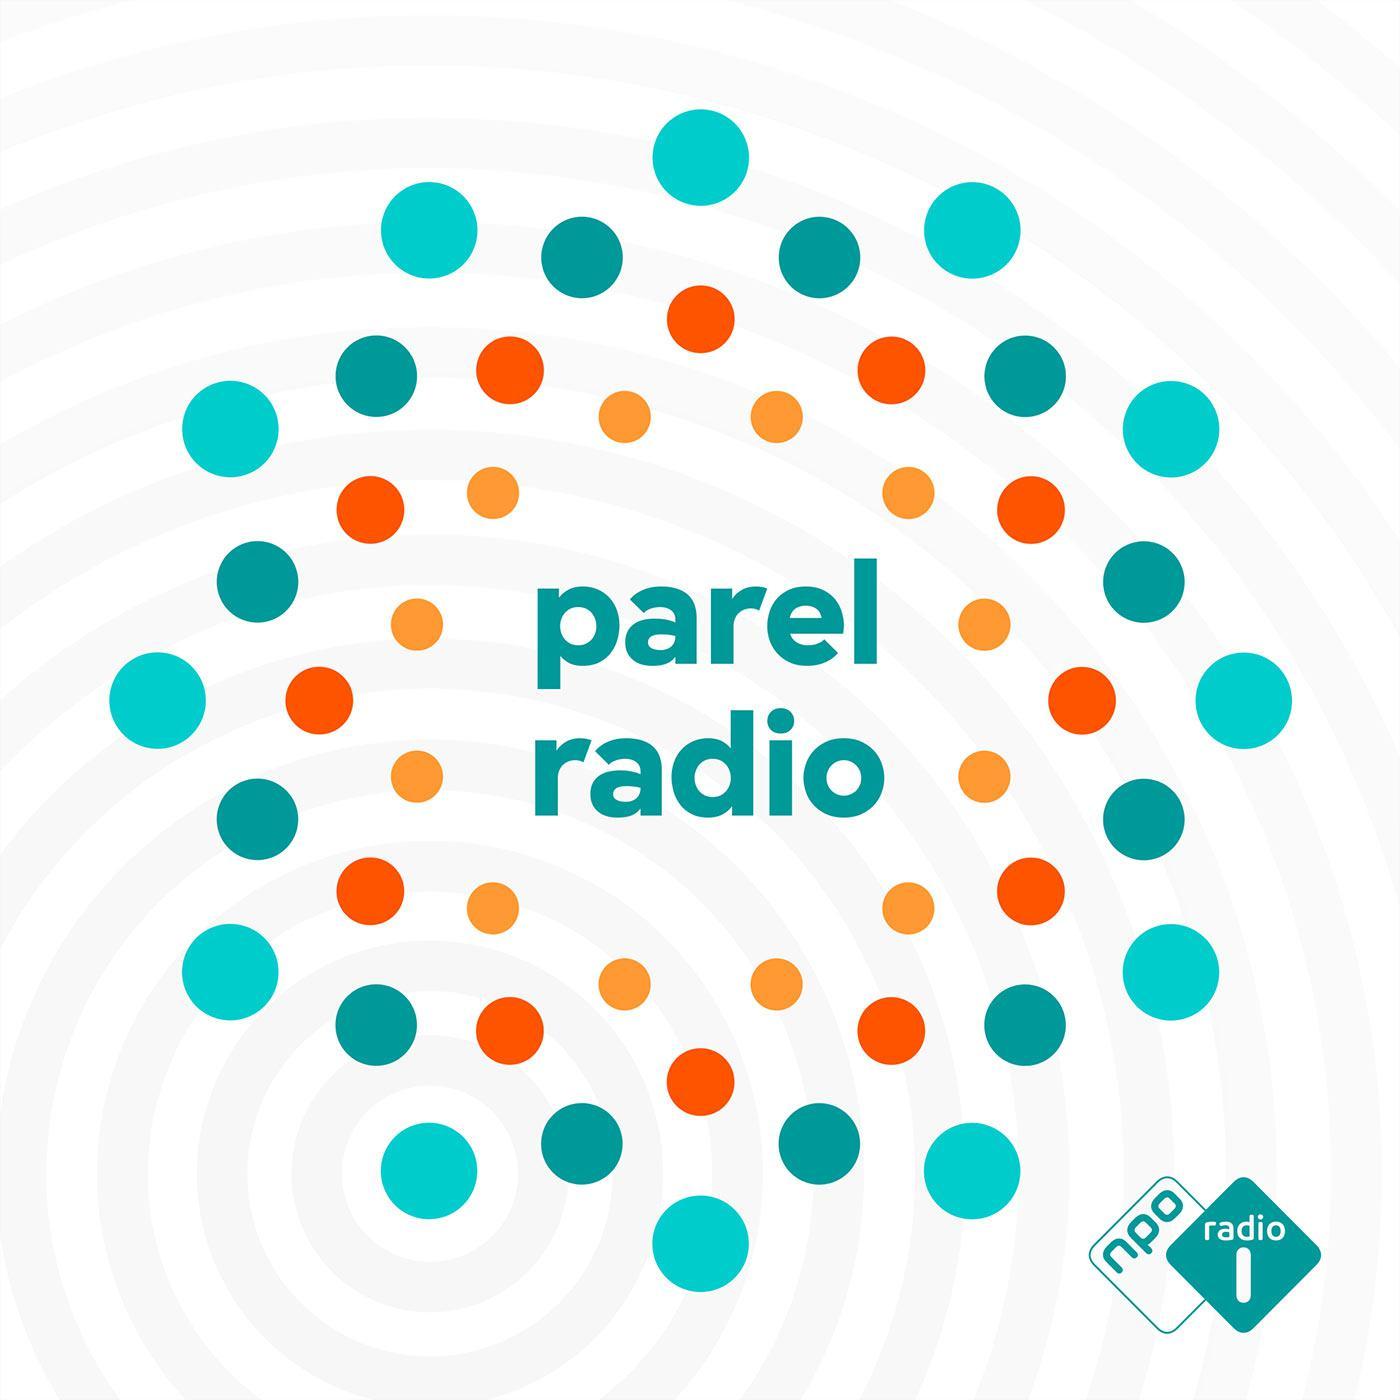 1. Parel Radio - VPRO